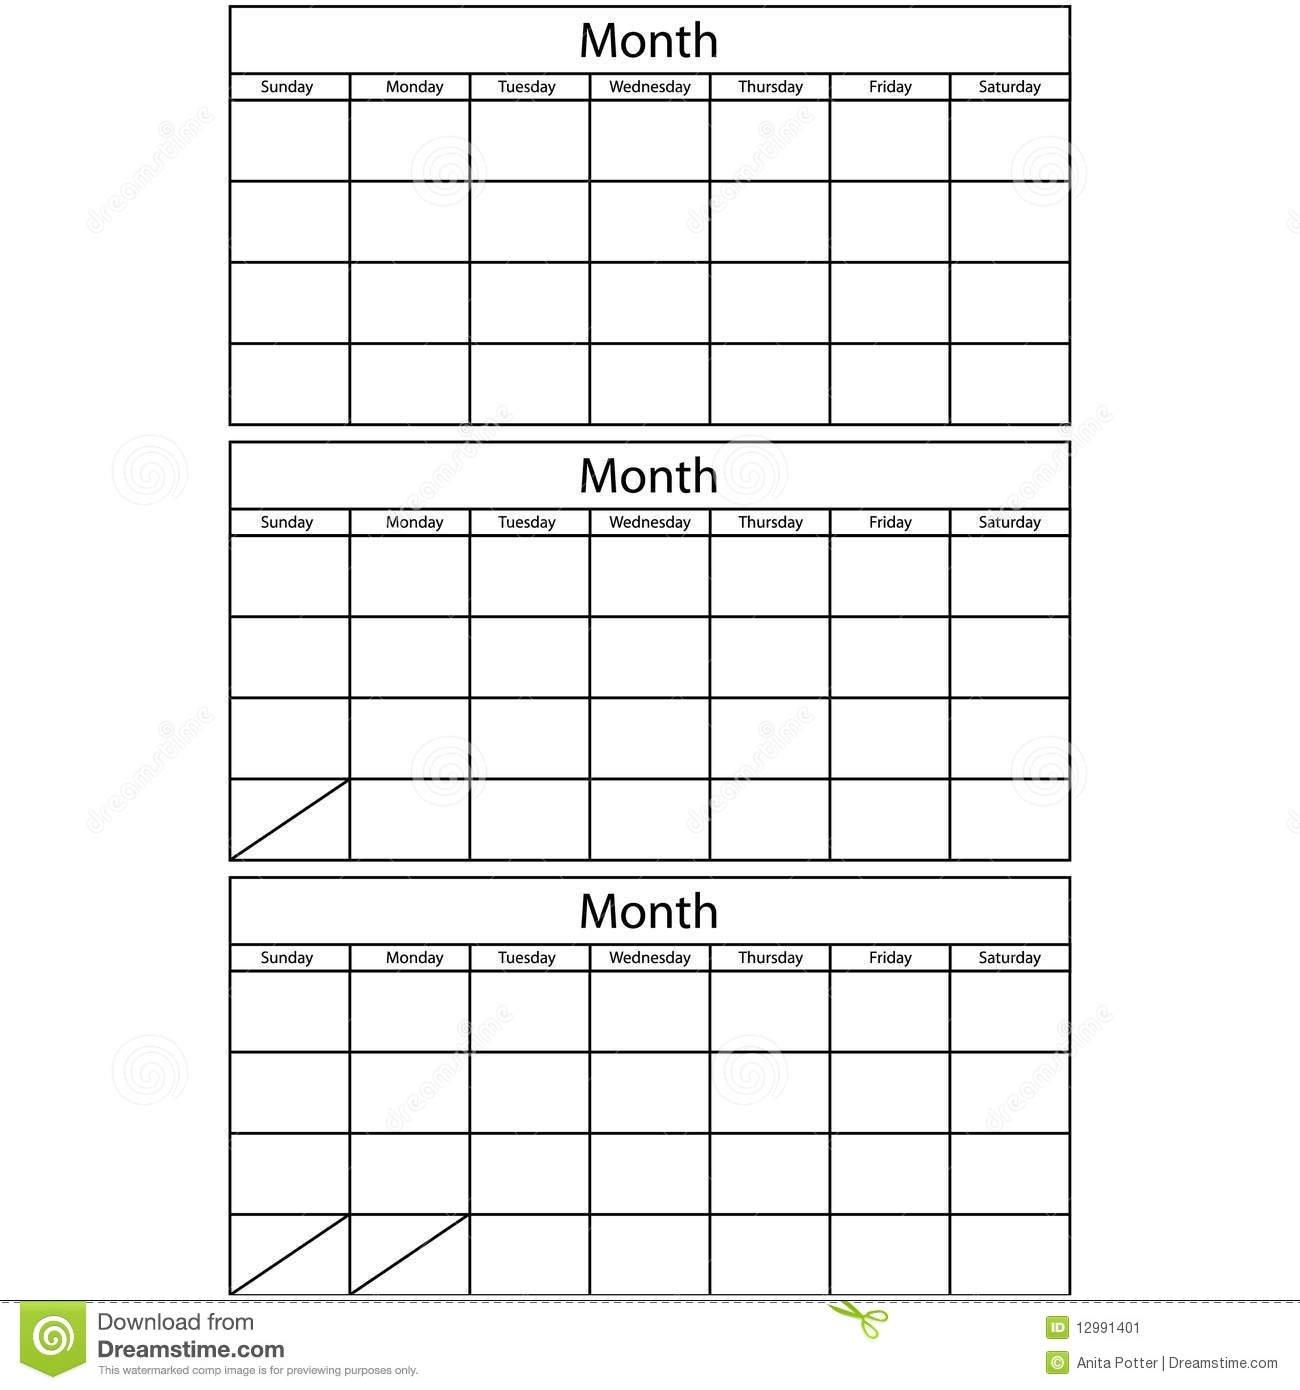 Printable Multi Month Calendars : Free Calendar Template Printable 3 Month Calendar